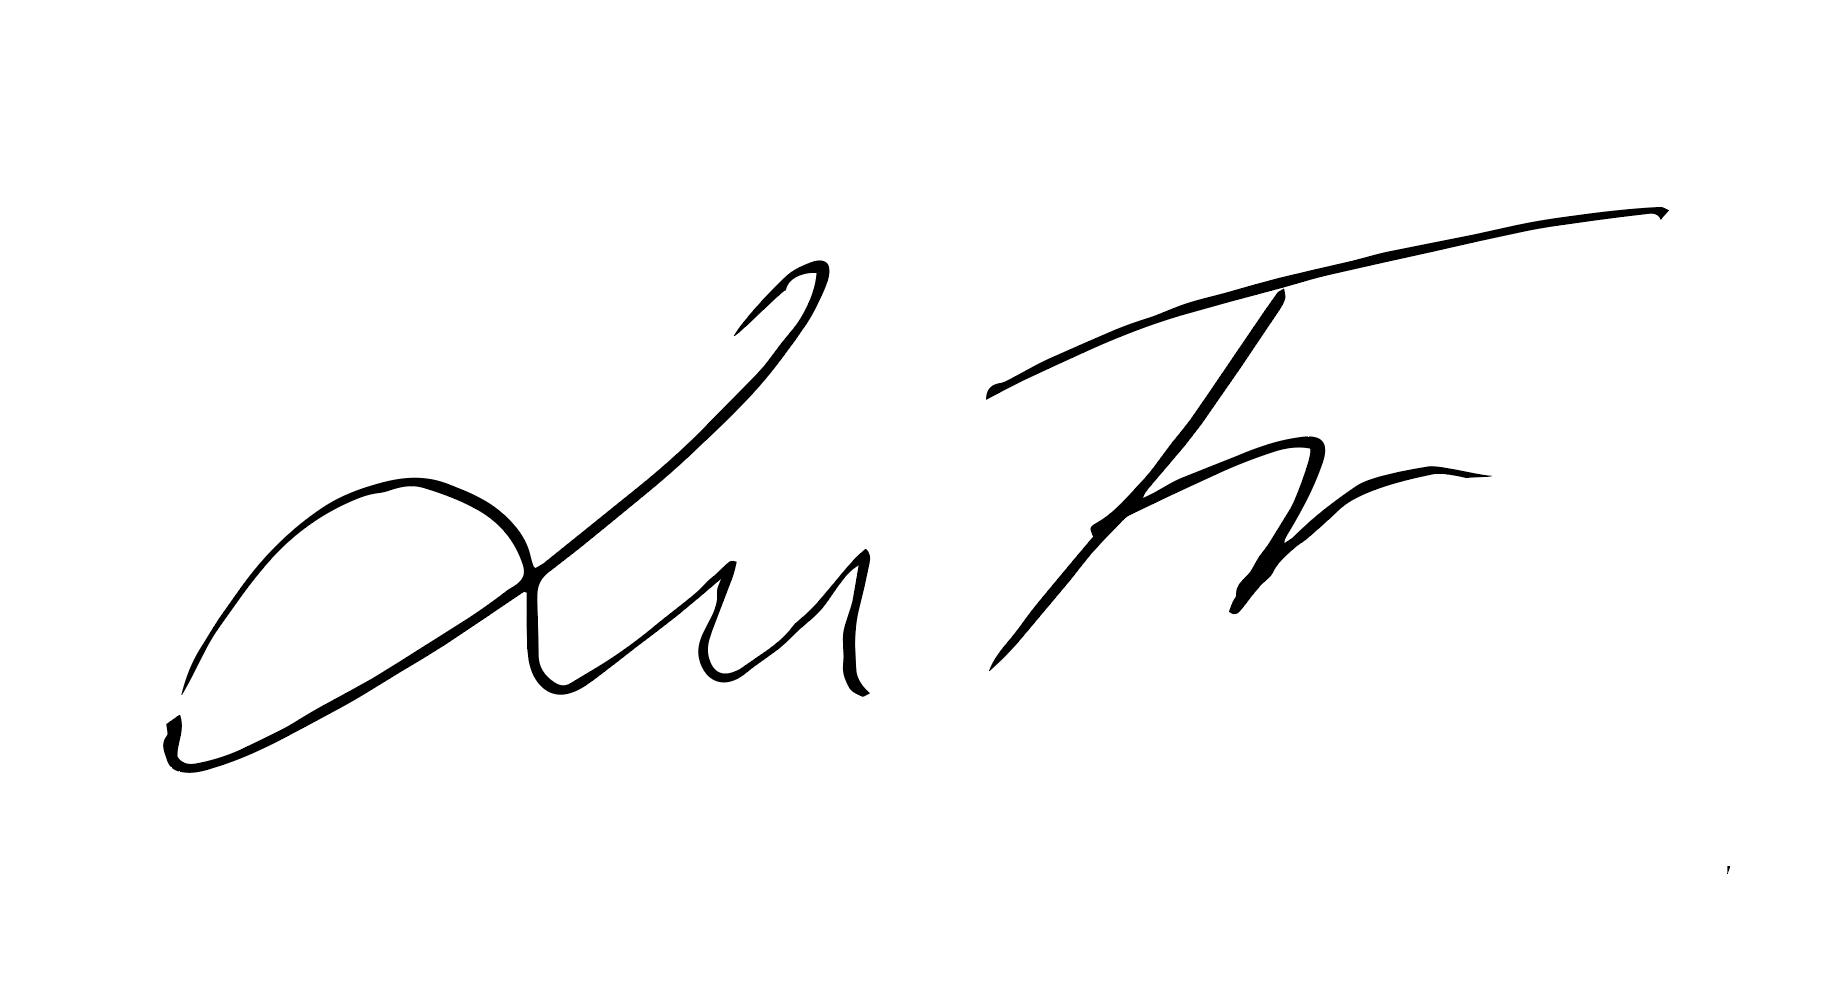 Lucie FrYDLOVA Signature